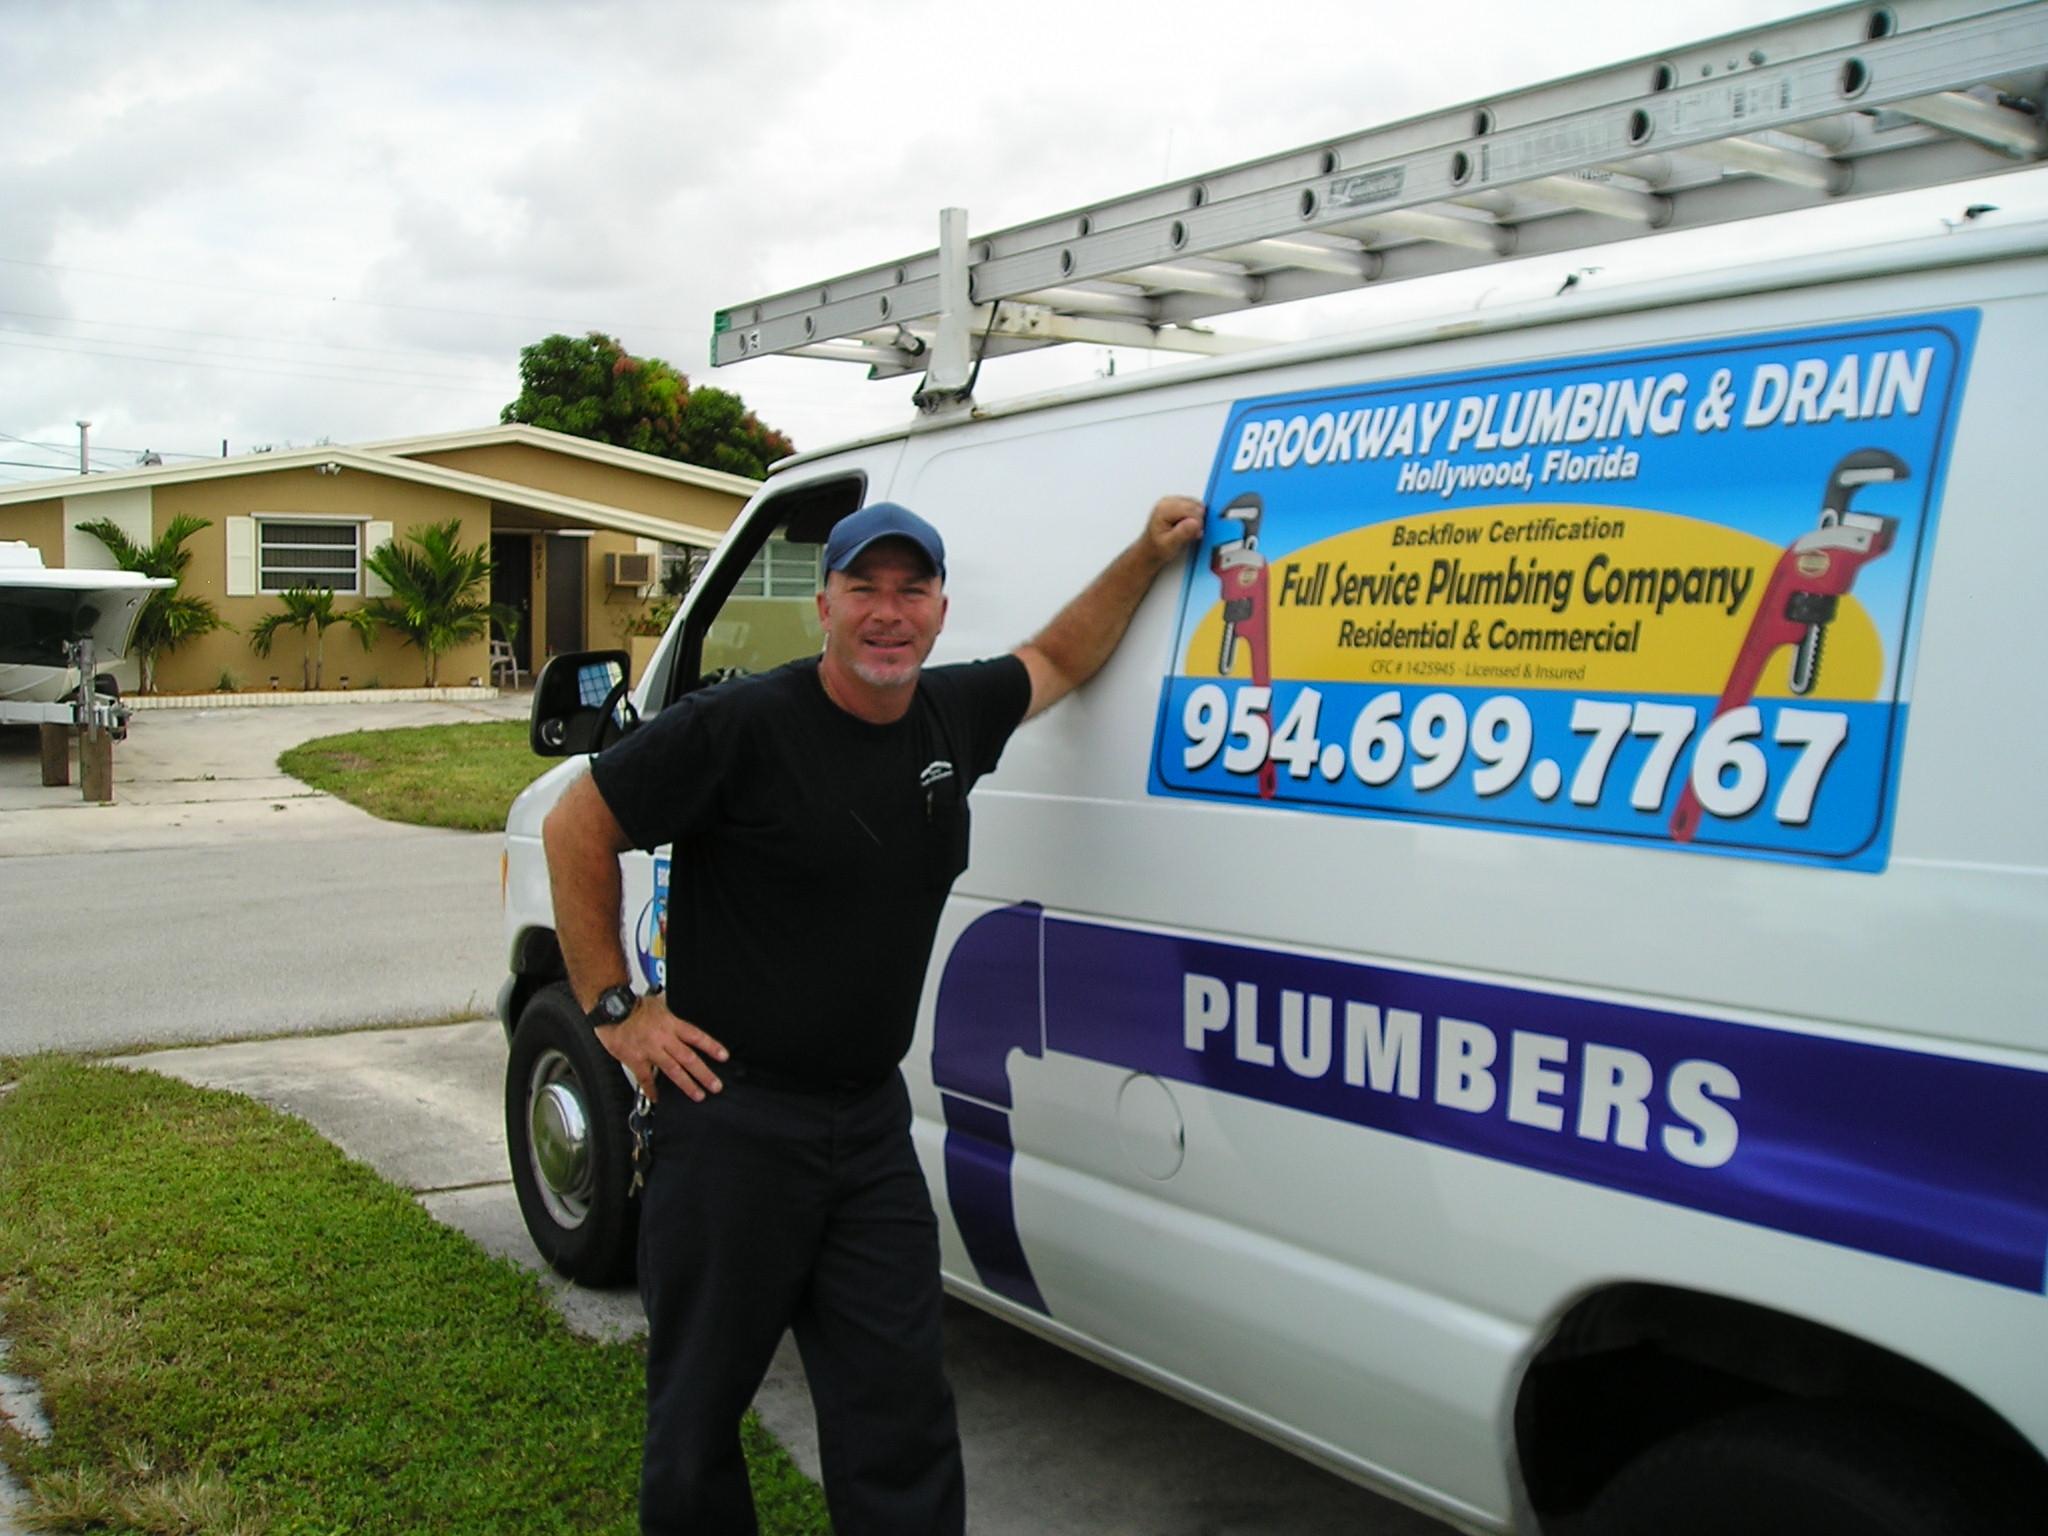 Brookway Plumbing & Drain, Hollywood LLC image 7